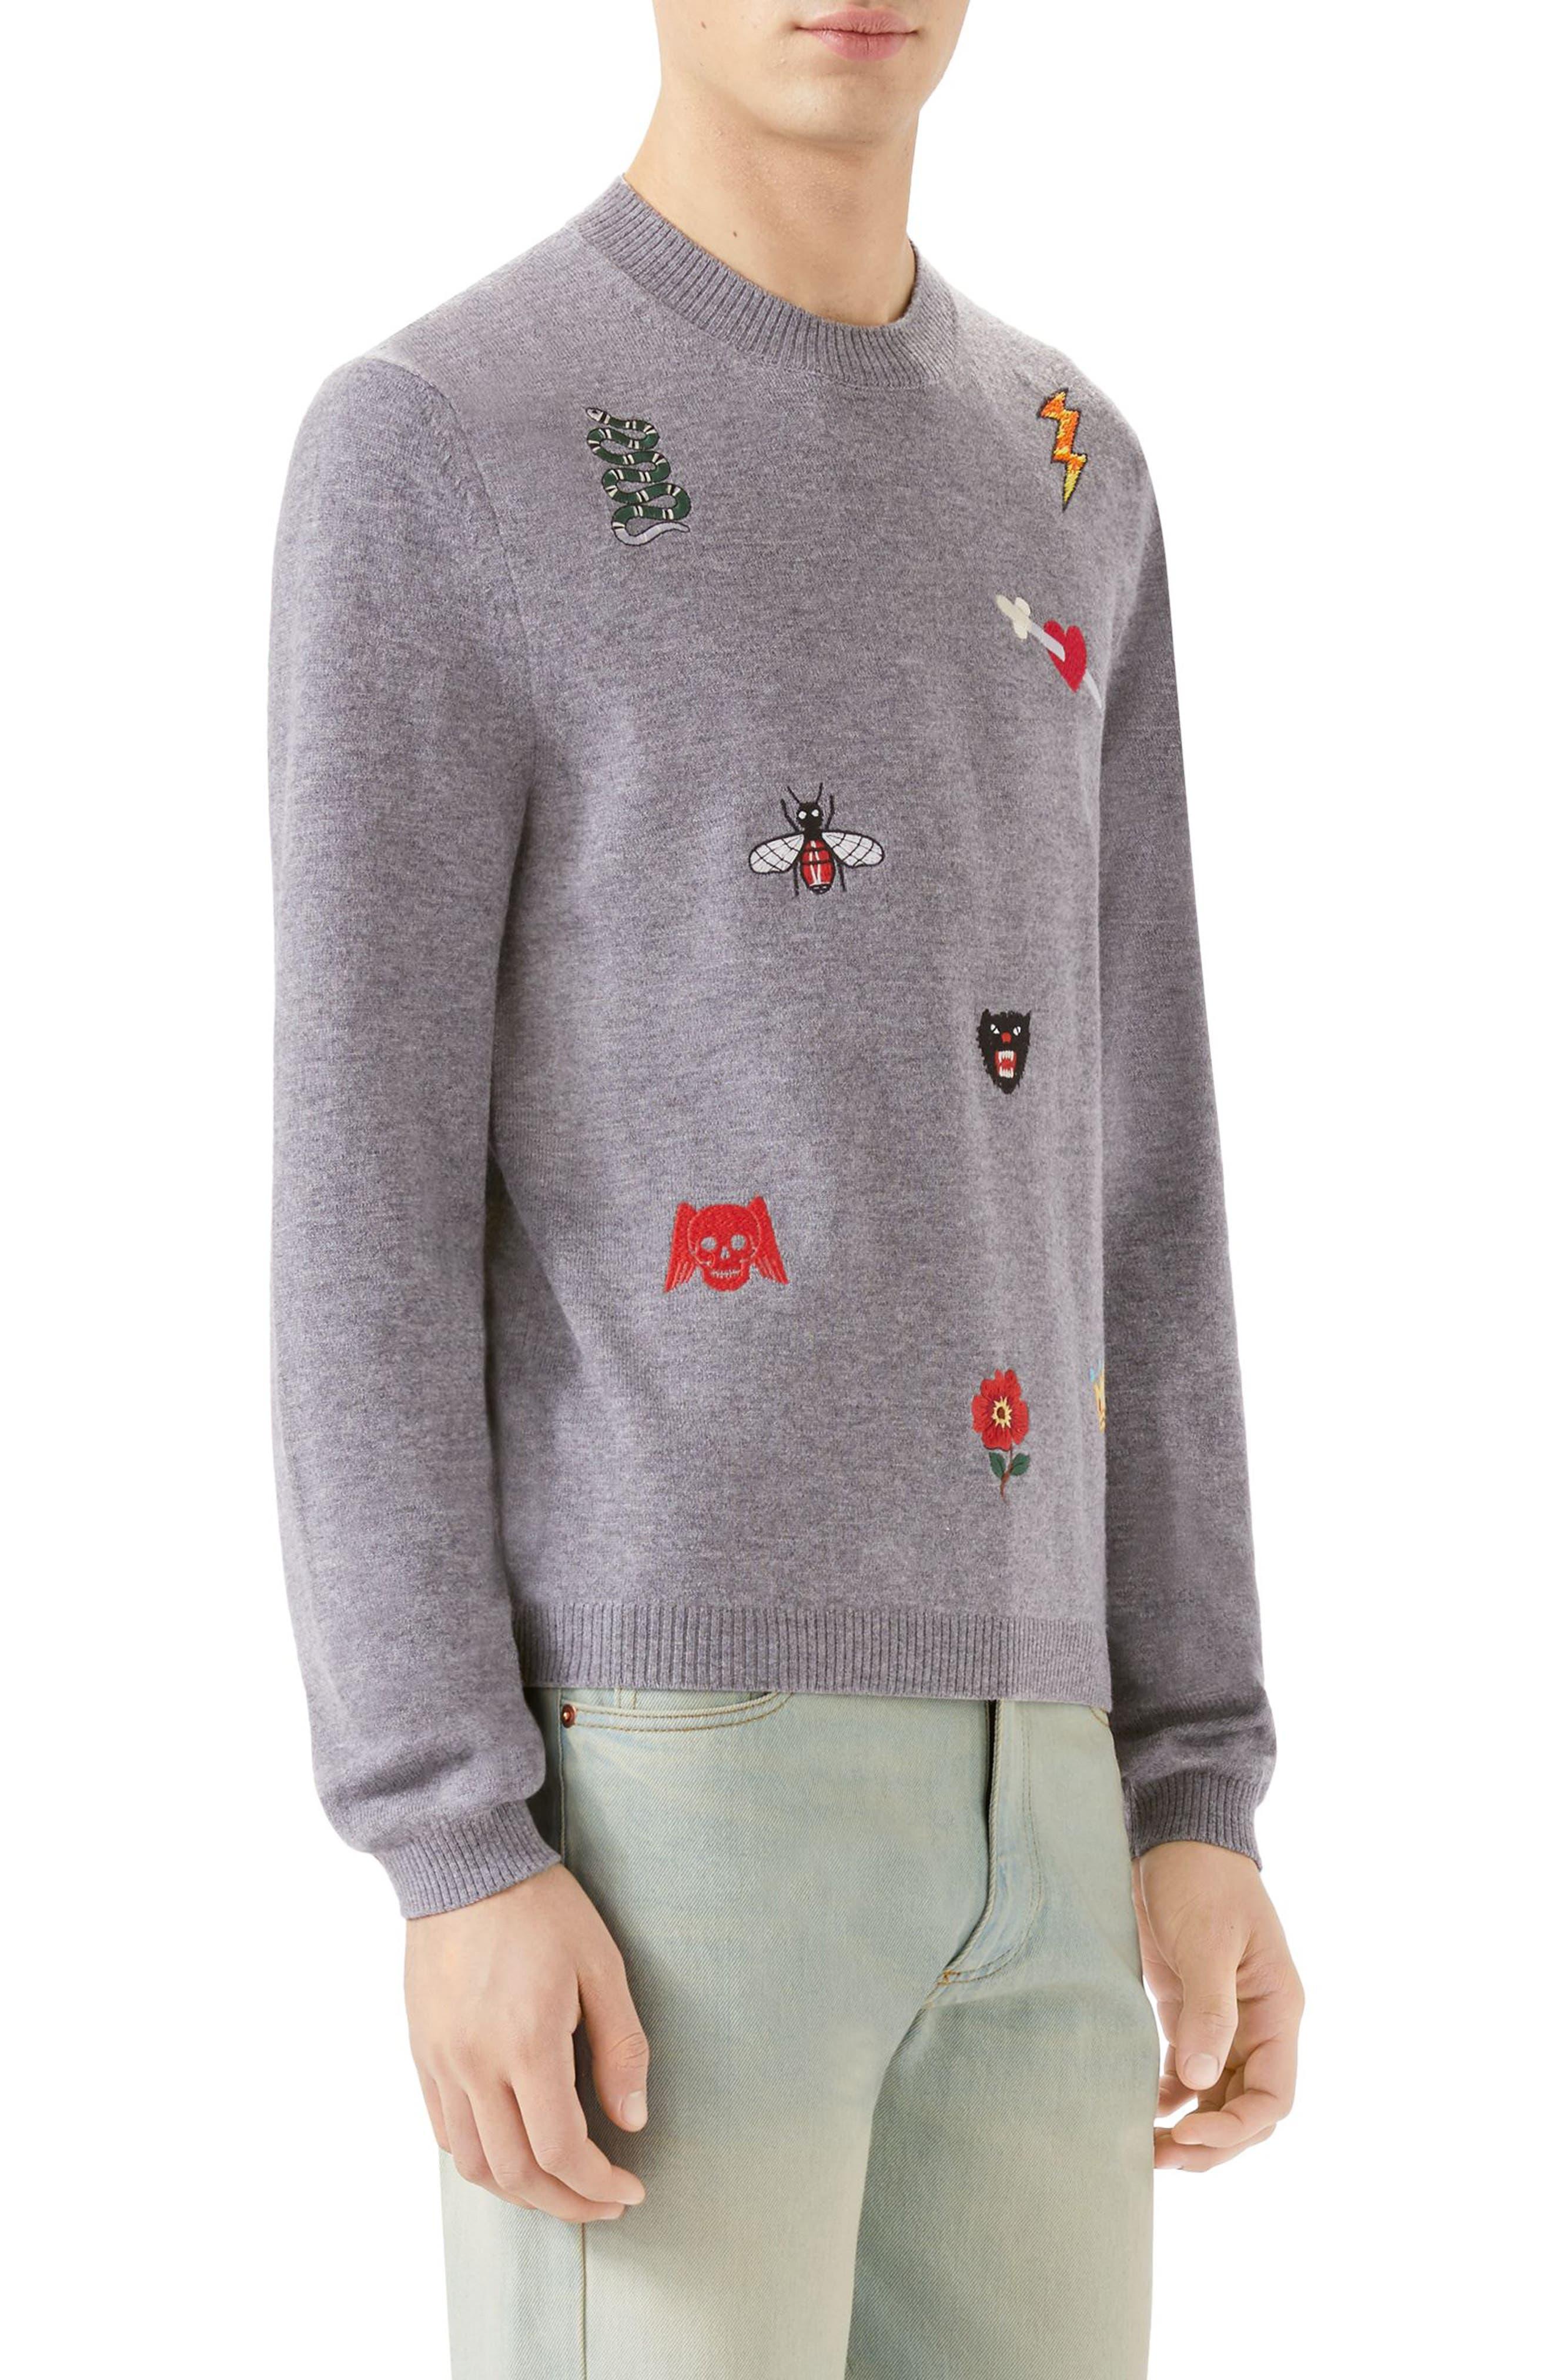 Embroidered Wool Crewneck Sweater,                             Alternate thumbnail 3, color,                             MEDIUM GREY